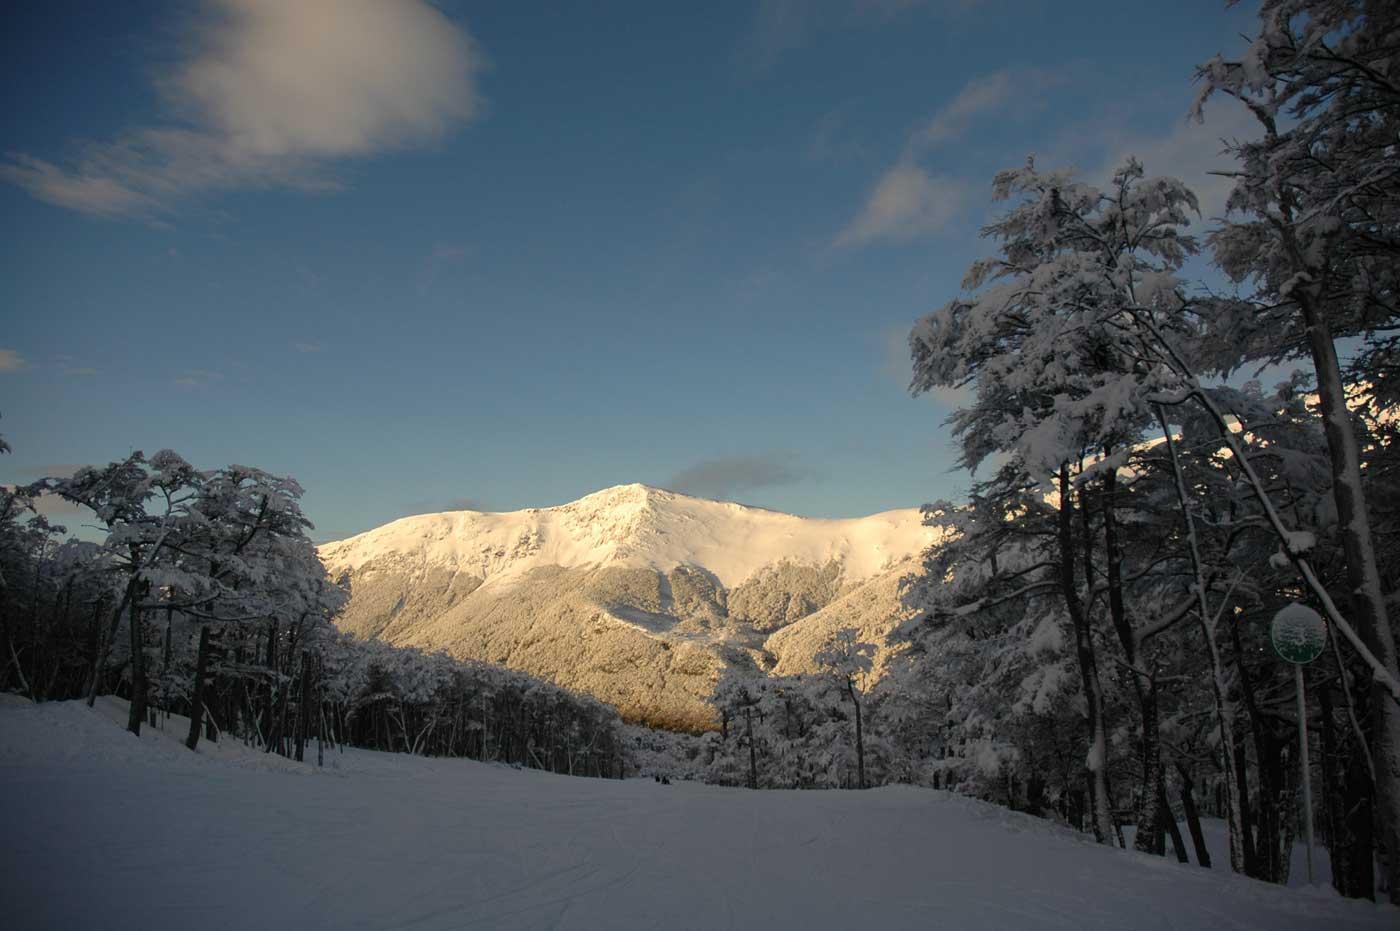 Cerro Castor